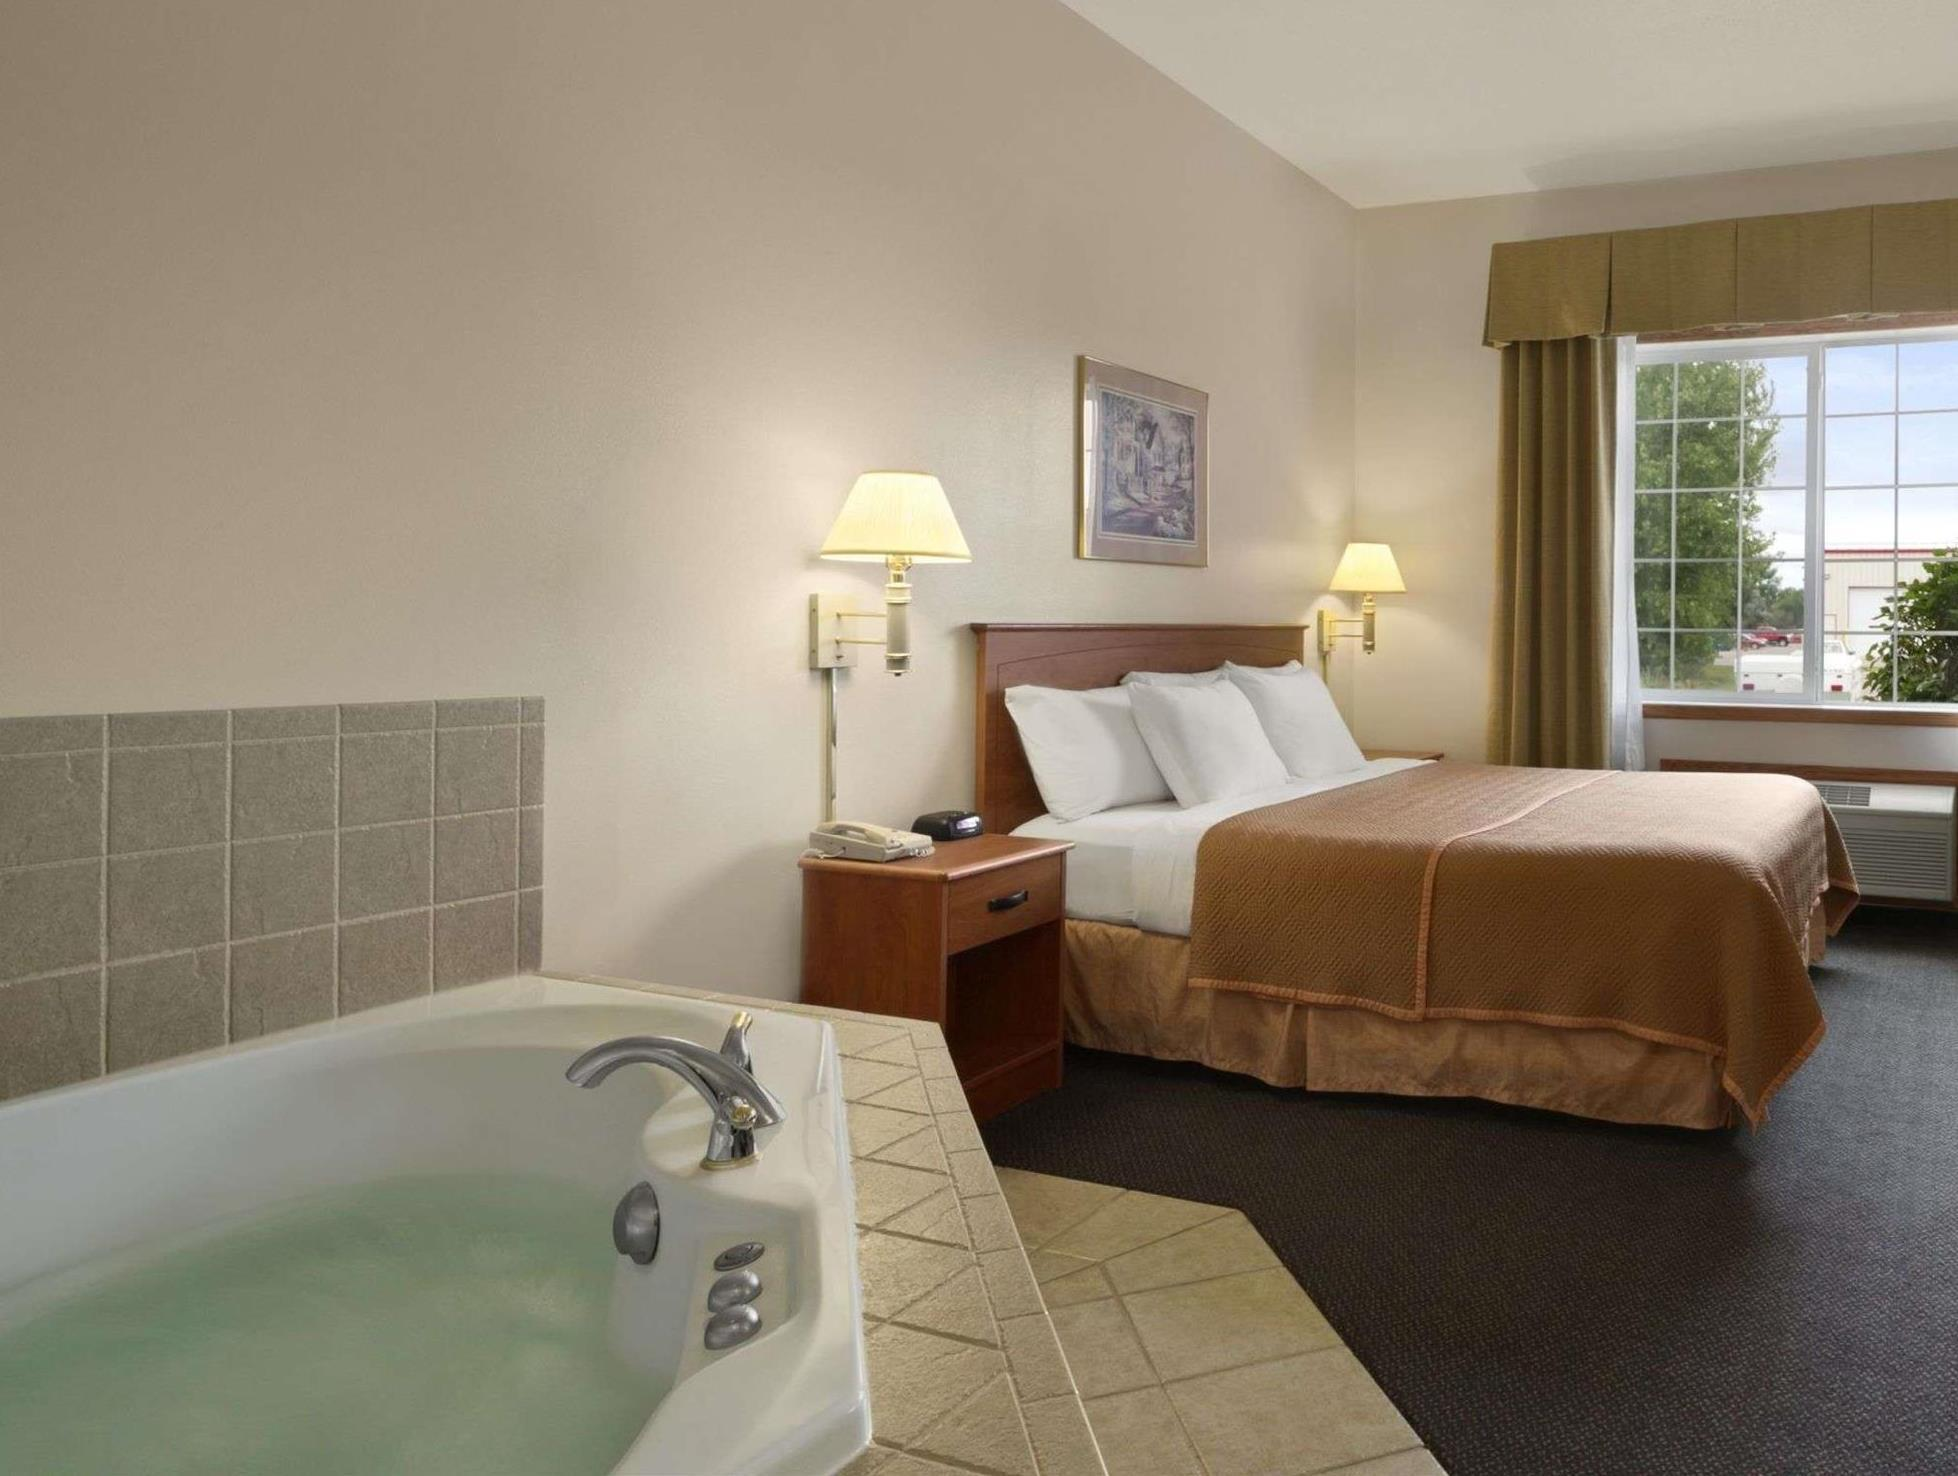 Travelodge & Suites By Wyndham Fargo Moorhead